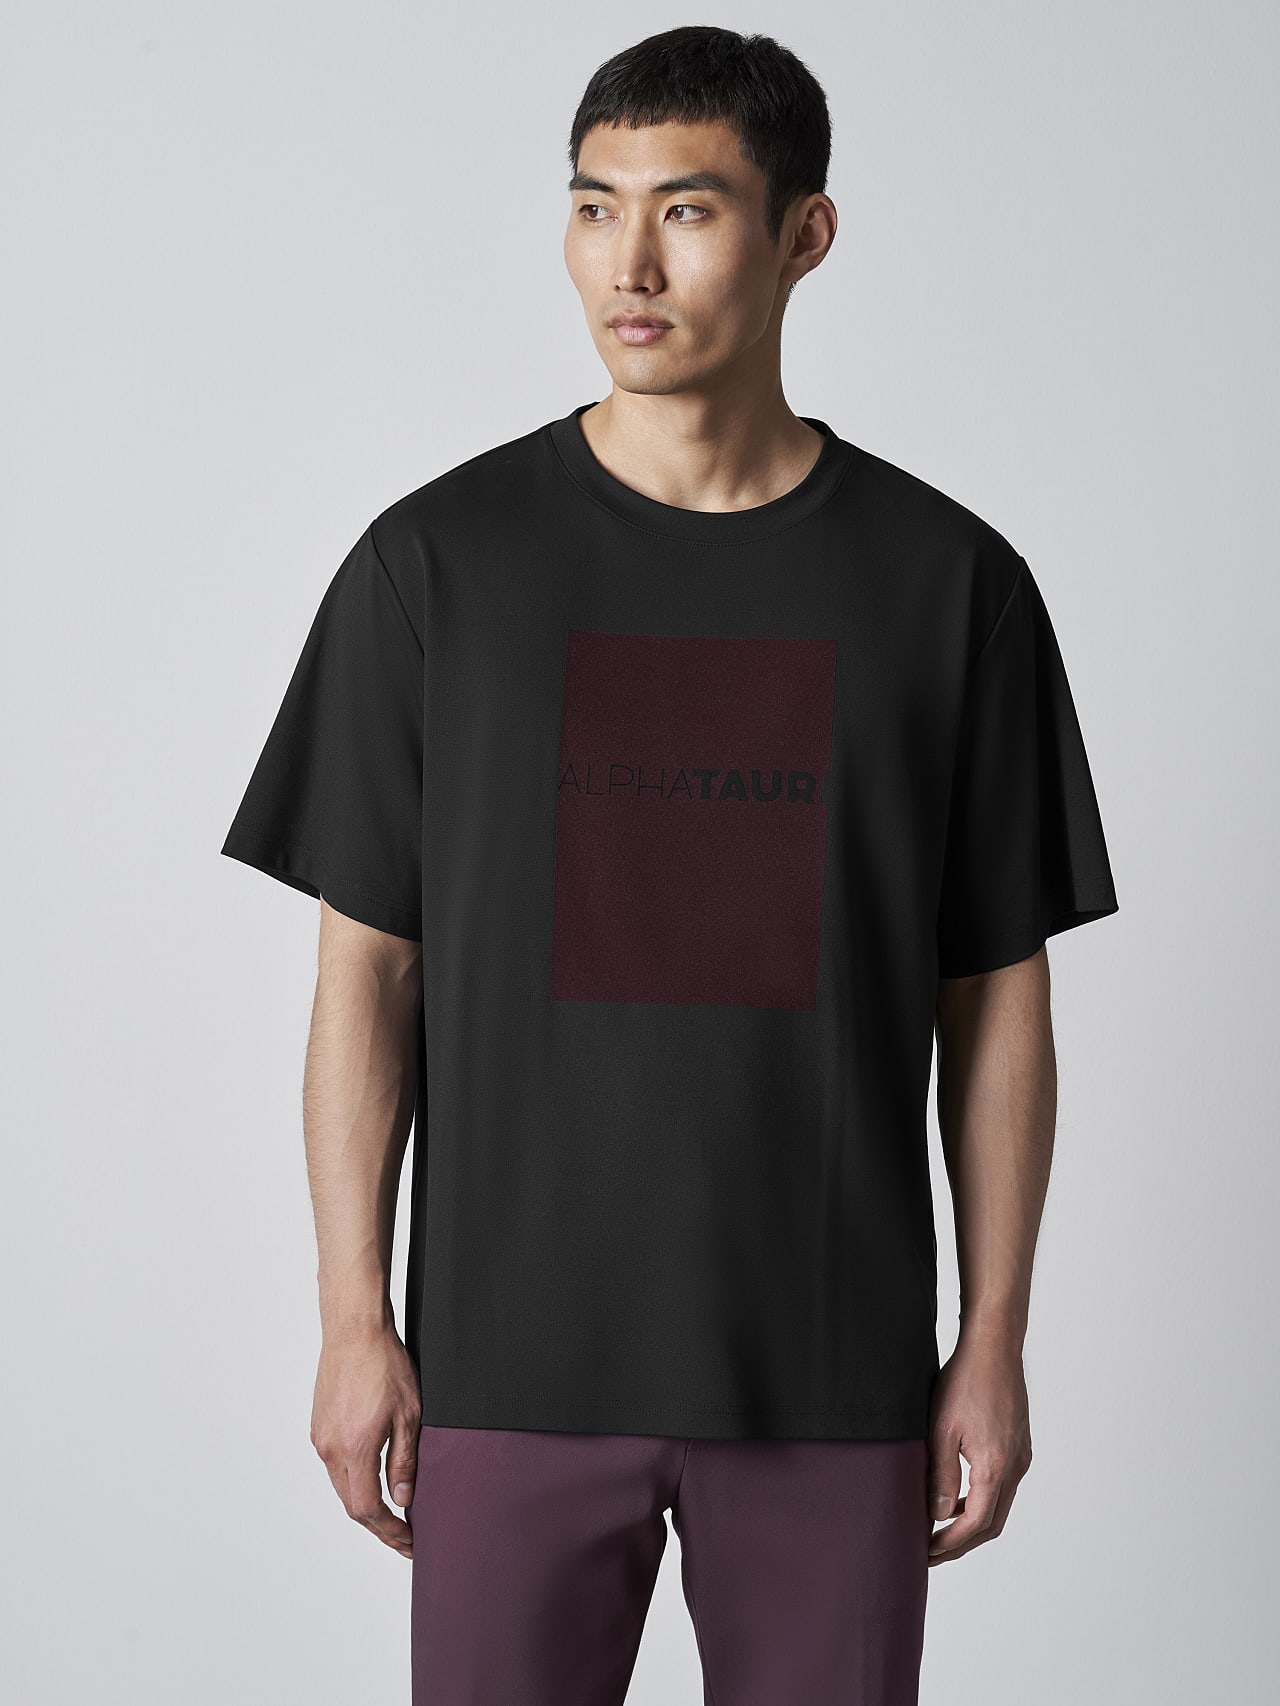 JAHEV V1.Y5.02 Relaxed Logo T-Shirt black Model shot Alpha Tauri